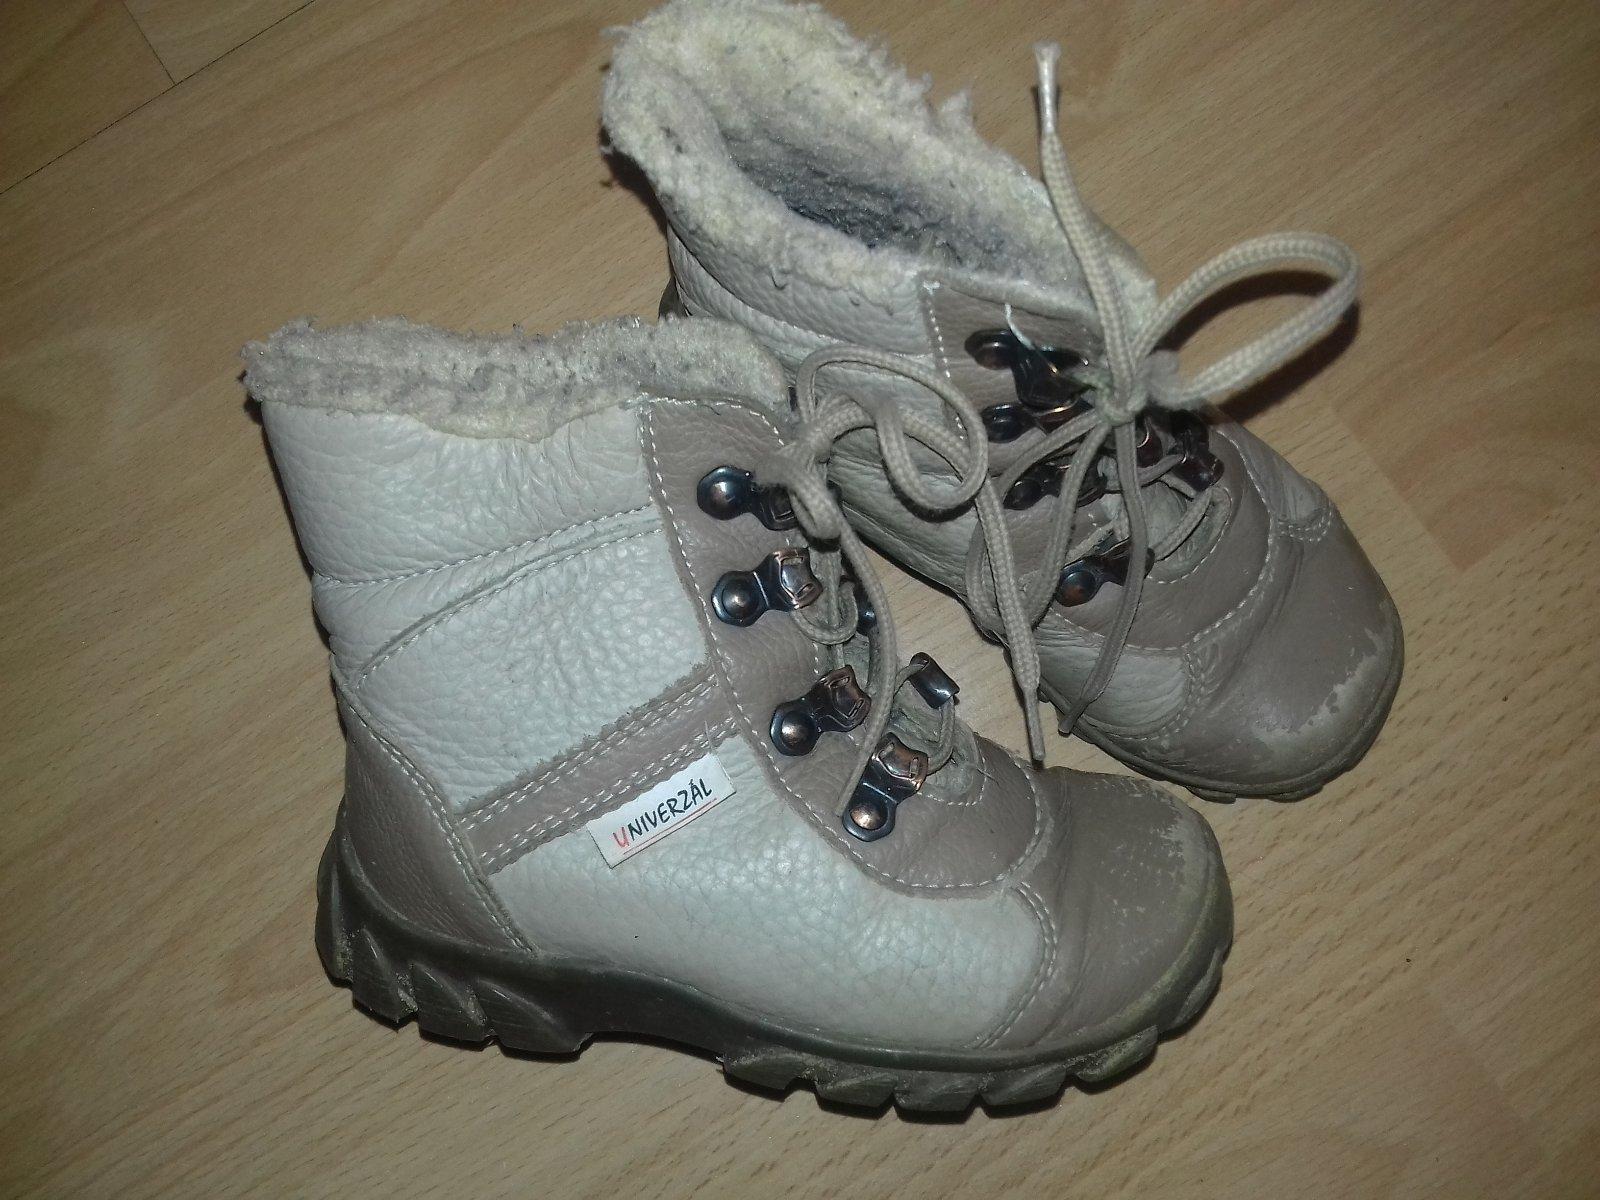 79b98fa9497a Zimné topánočky